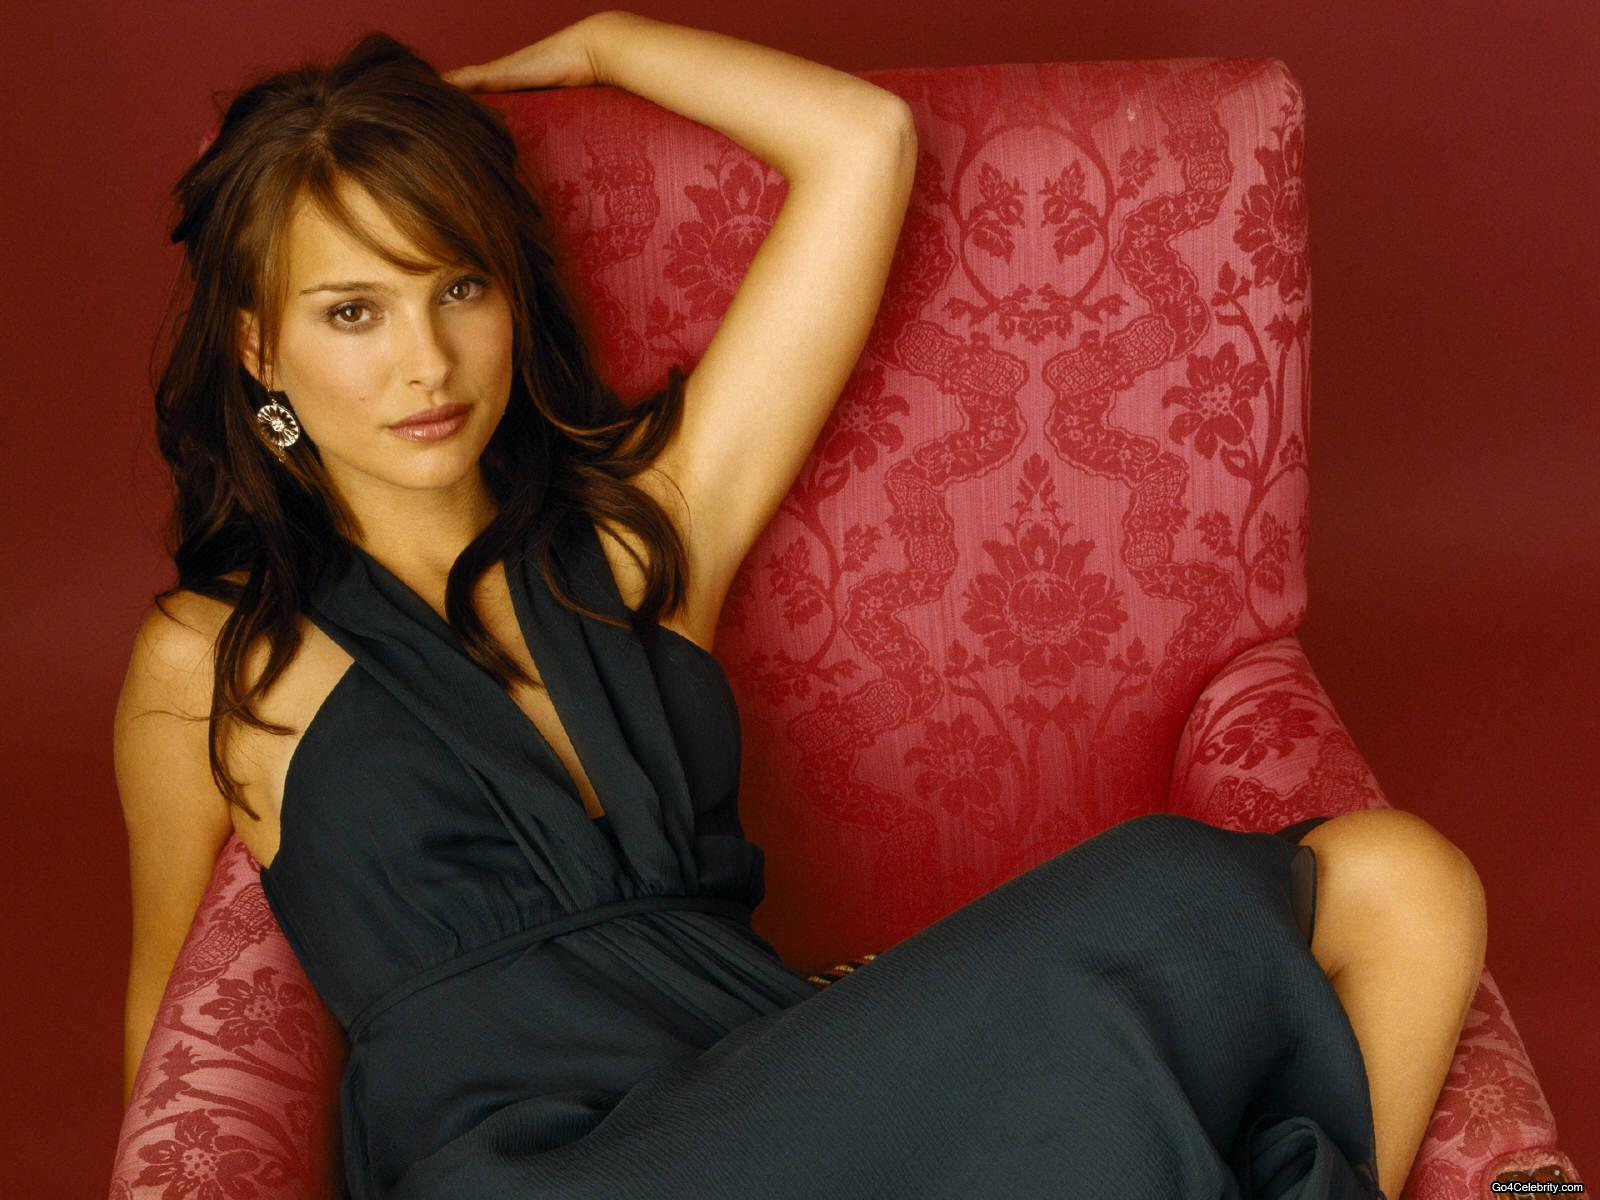 http://4.bp.blogspot.com/-aRUpkMGtoSo/T-WnUPwfbWI/AAAAAAAAFJY/TVLikwFJtlM/s1600/Natalie-portman-hot-sexy-picture+(10).jpg